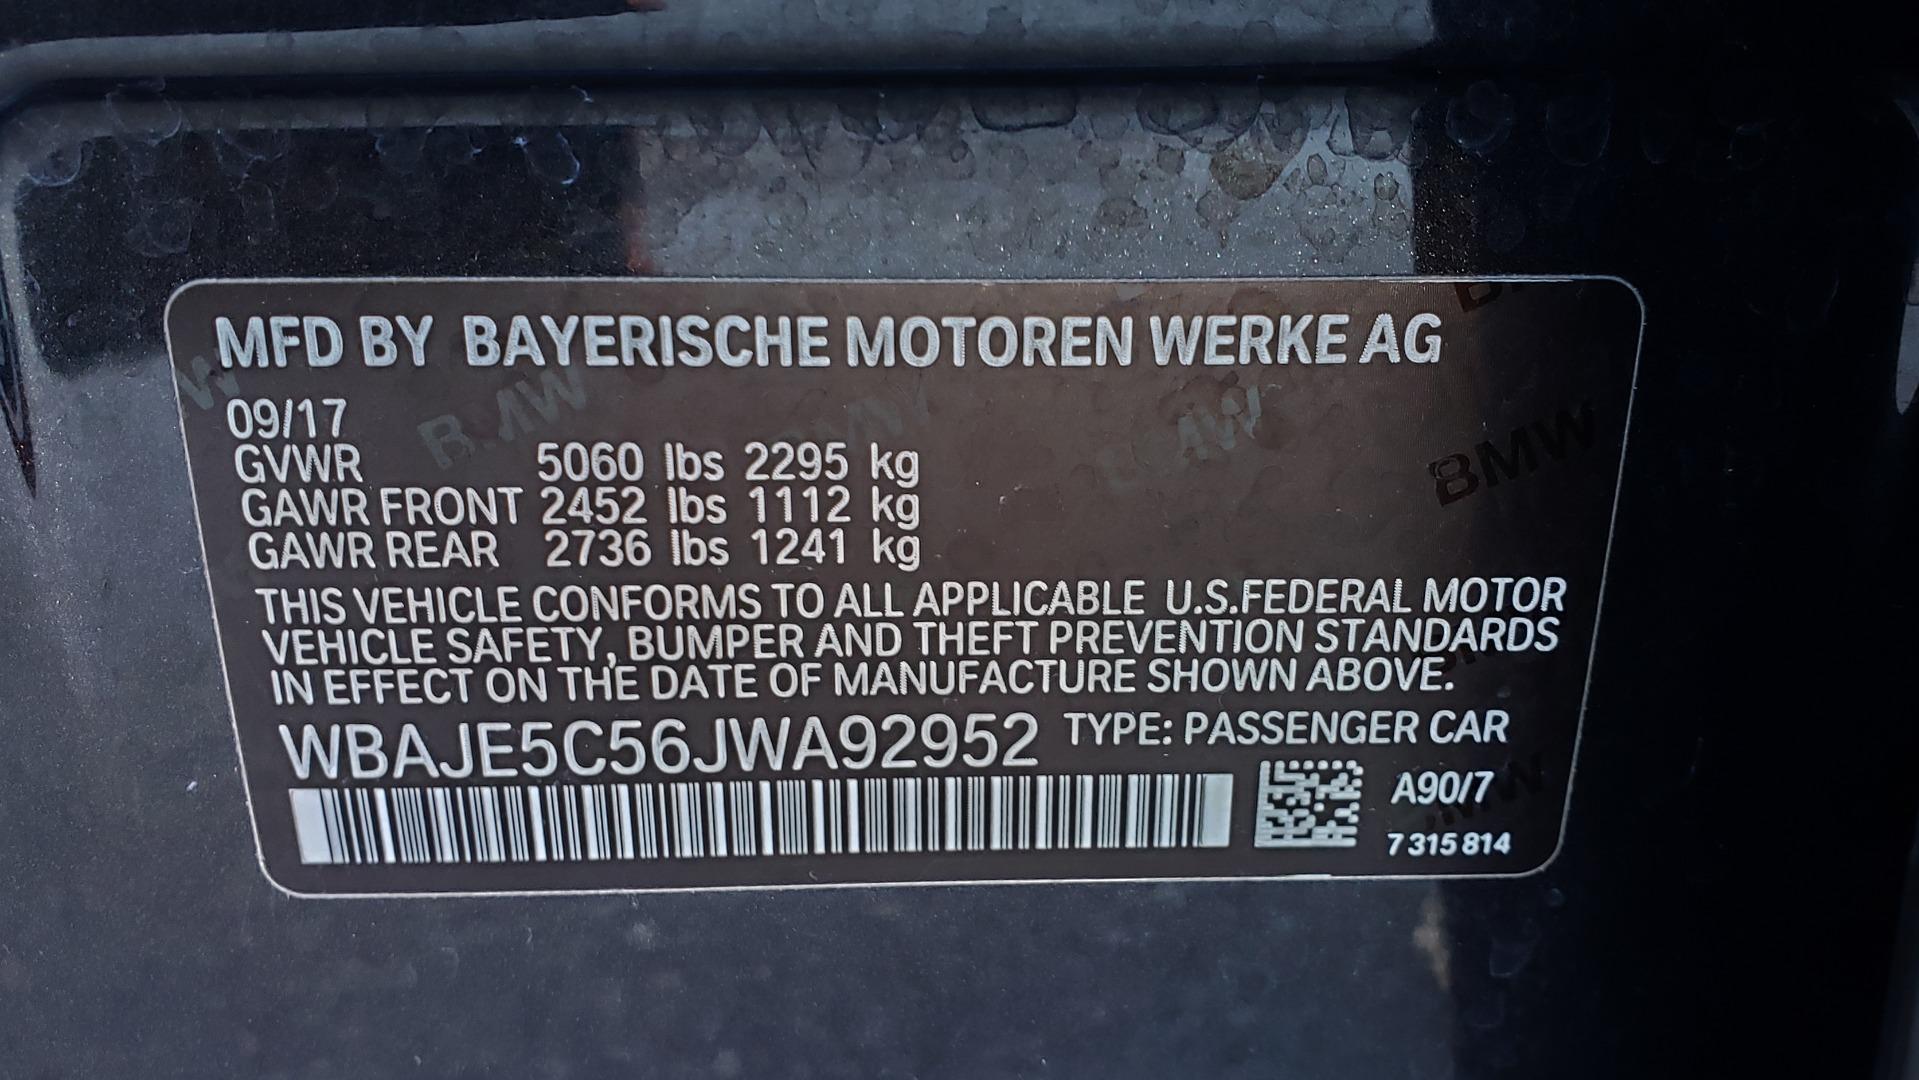 Used 2018 BMW 5 SERIES 540I M-SPORT / DRVR ASST / EXEC PKG / NAV / SUNROOF / HUD / REARVIEW for sale Sold at Formula Imports in Charlotte NC 28227 86